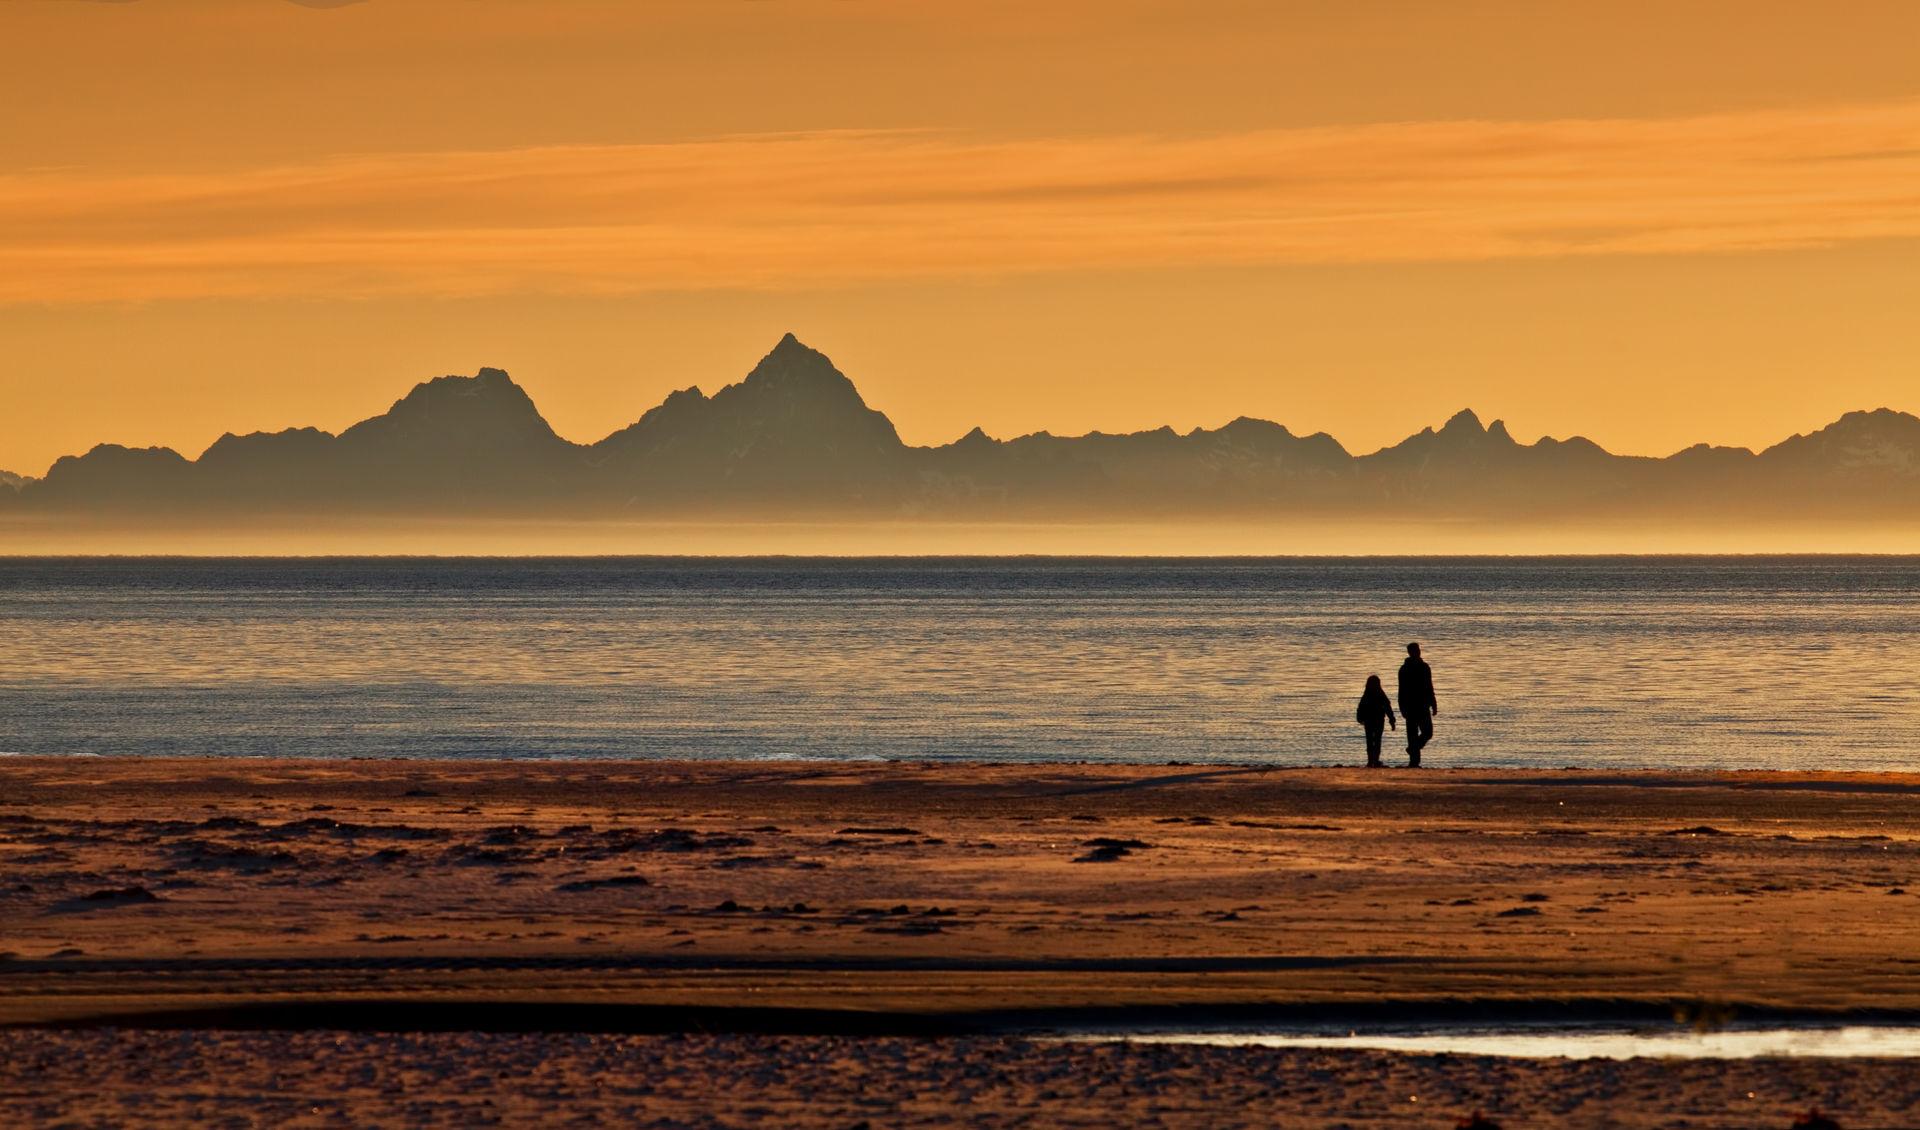 Find your own beach to experience the midnight sun © Terje Johansen